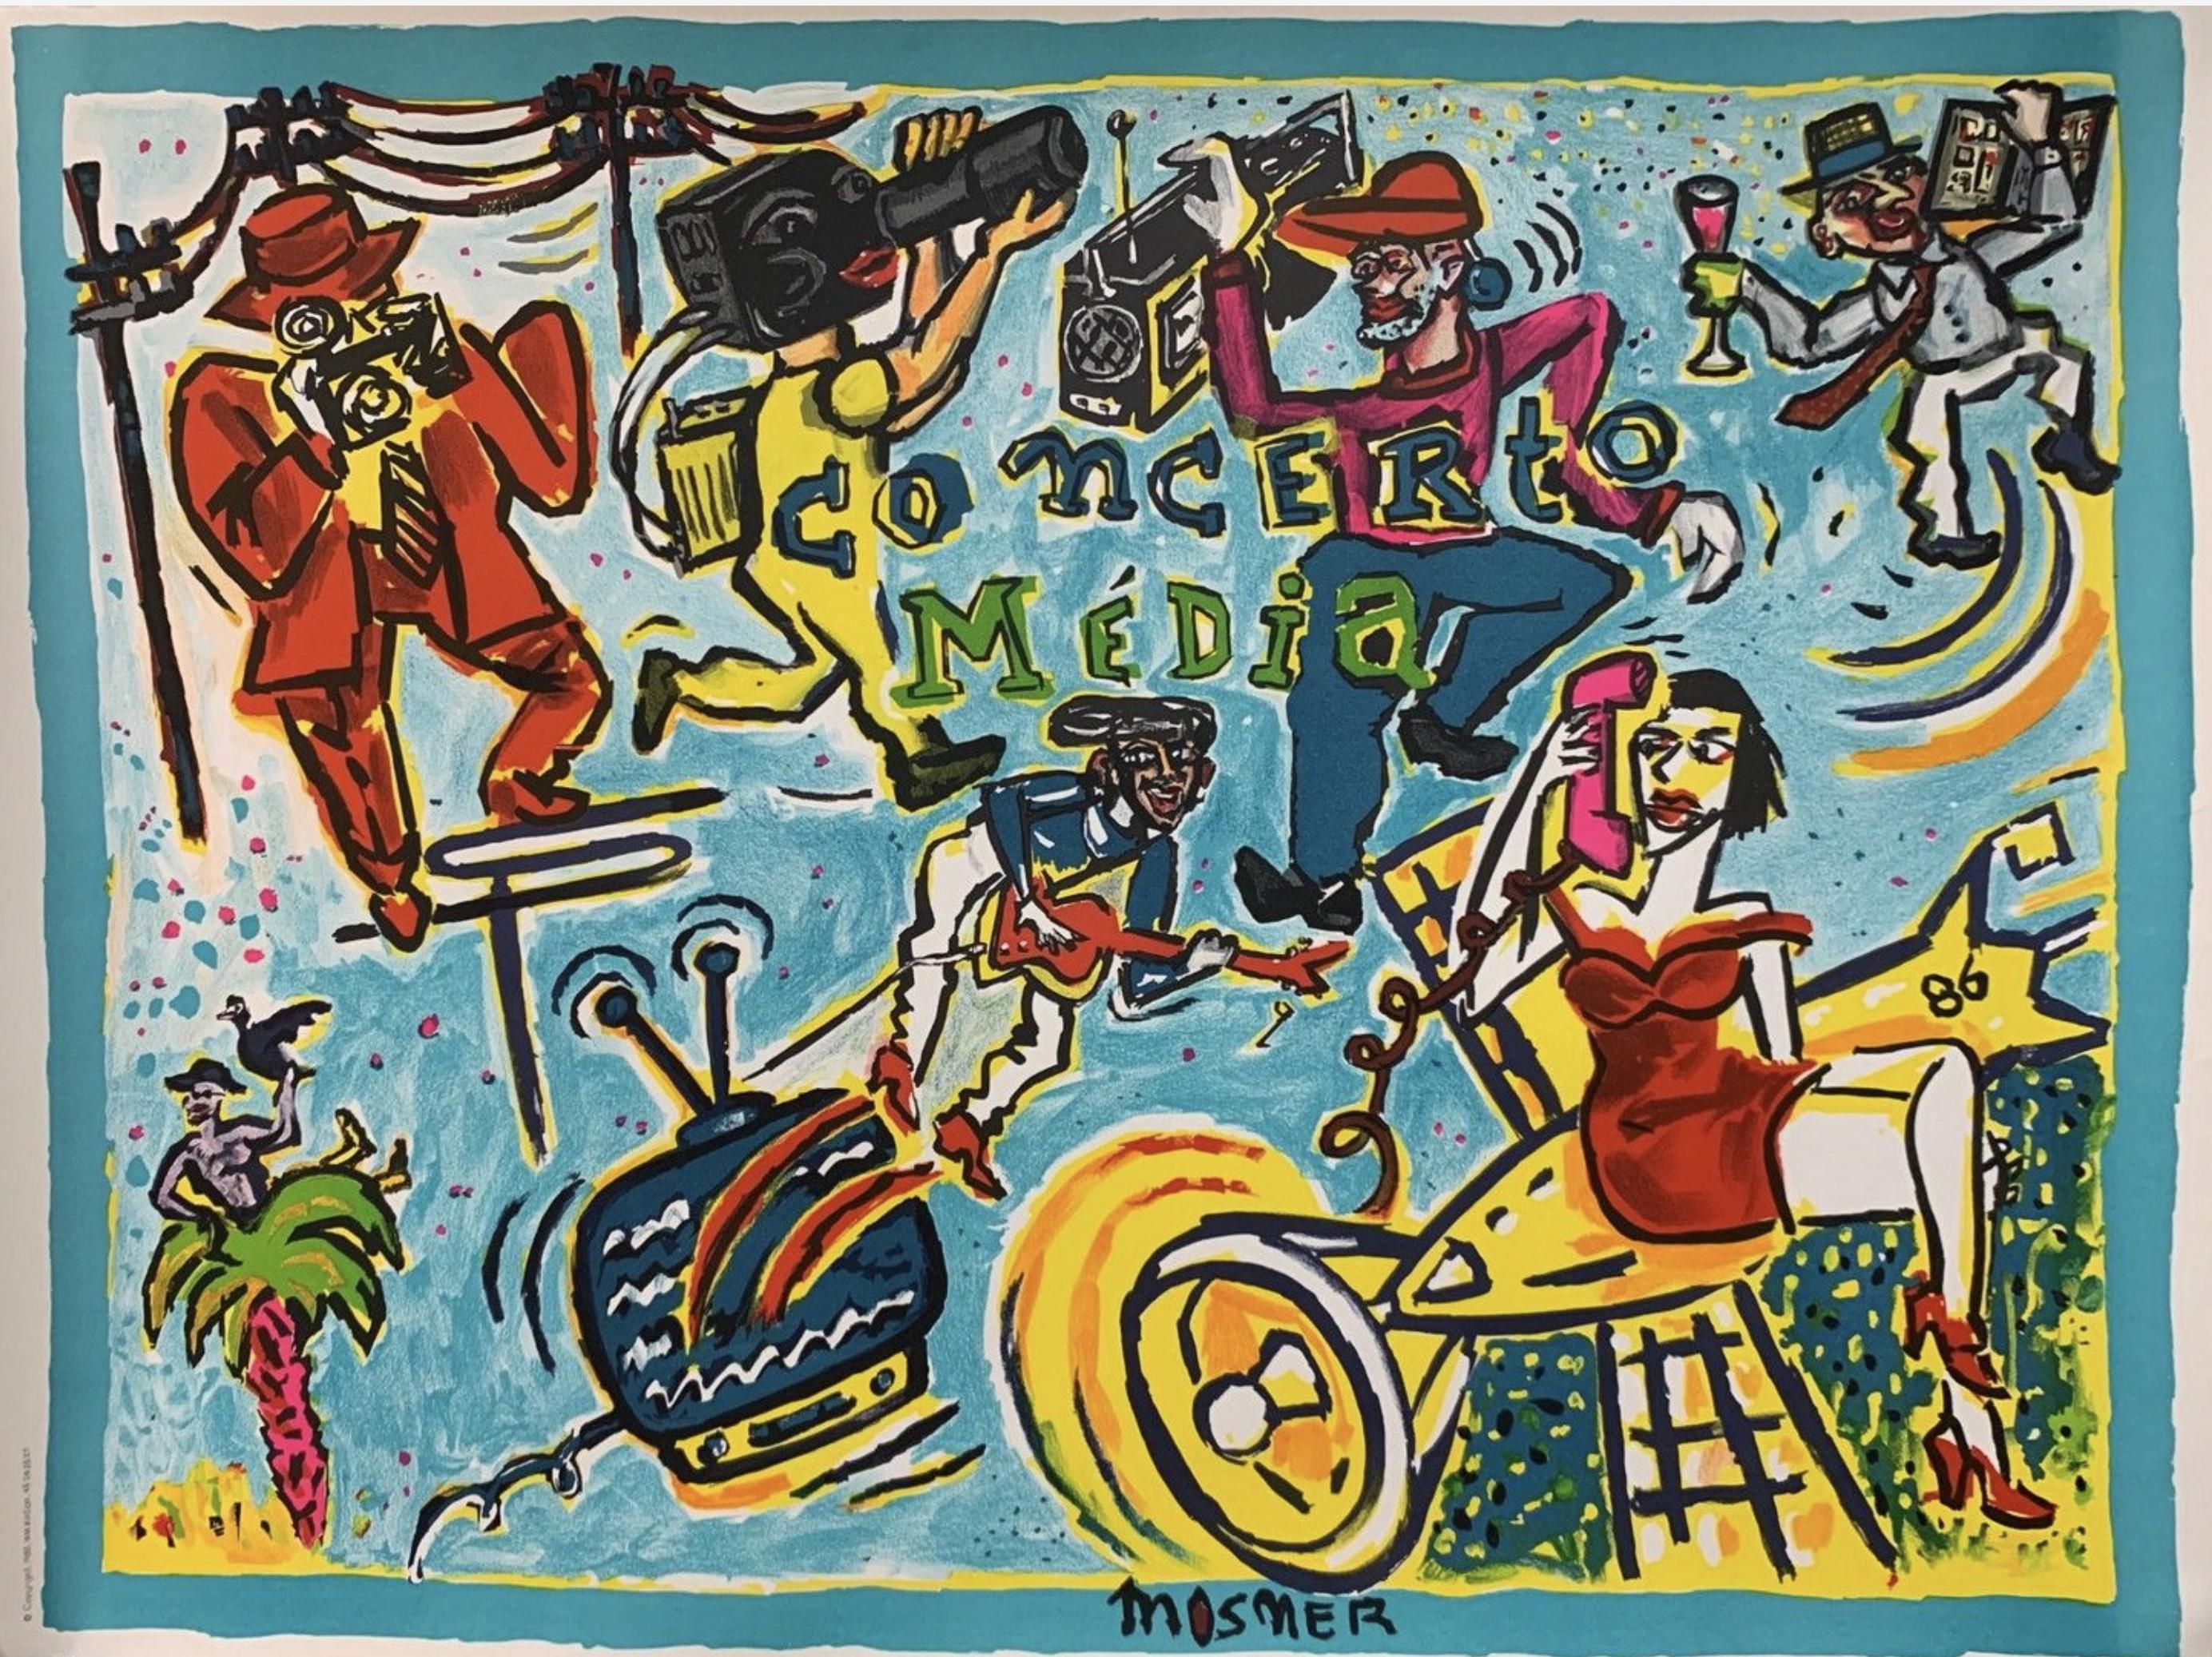 Concerto Media MOSNER Original Vintage Poster Letitia Morris Gallery